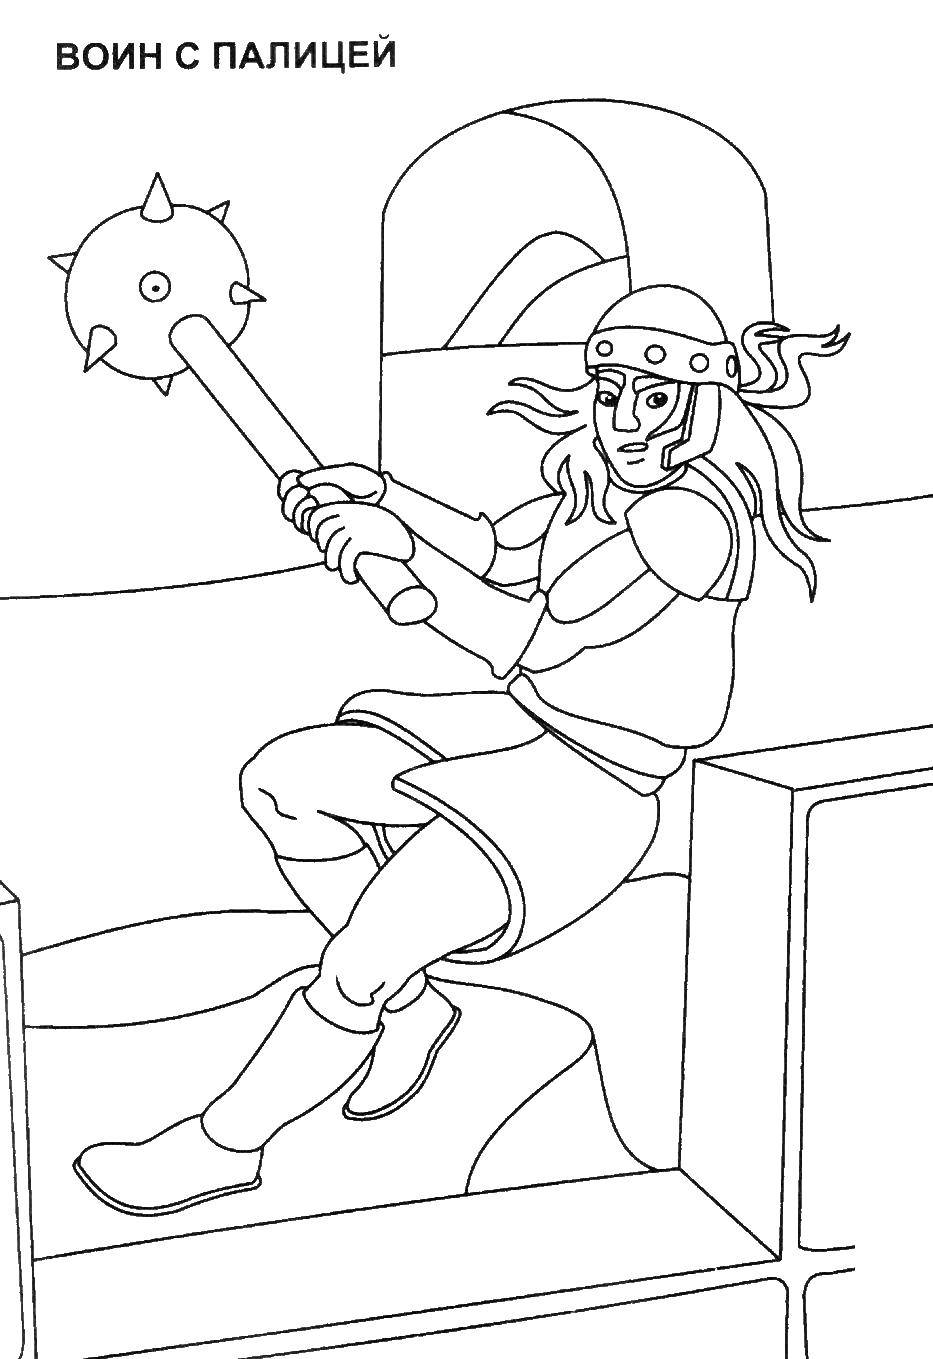 Coloring sheet the crusaders Download .  Print